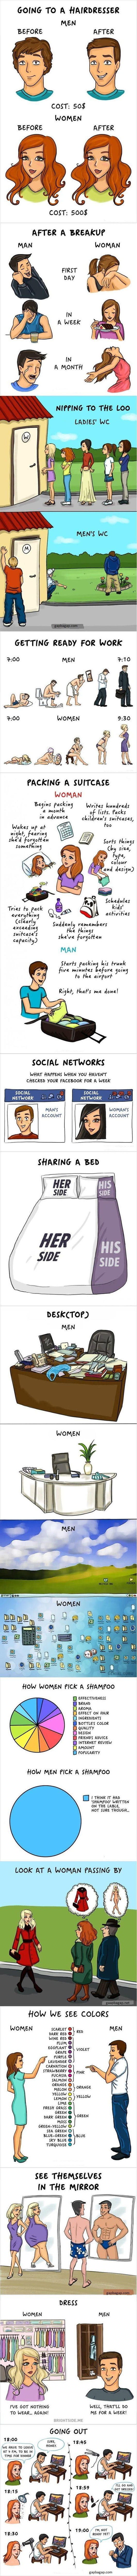 Funny Photos Of Men vs. Women